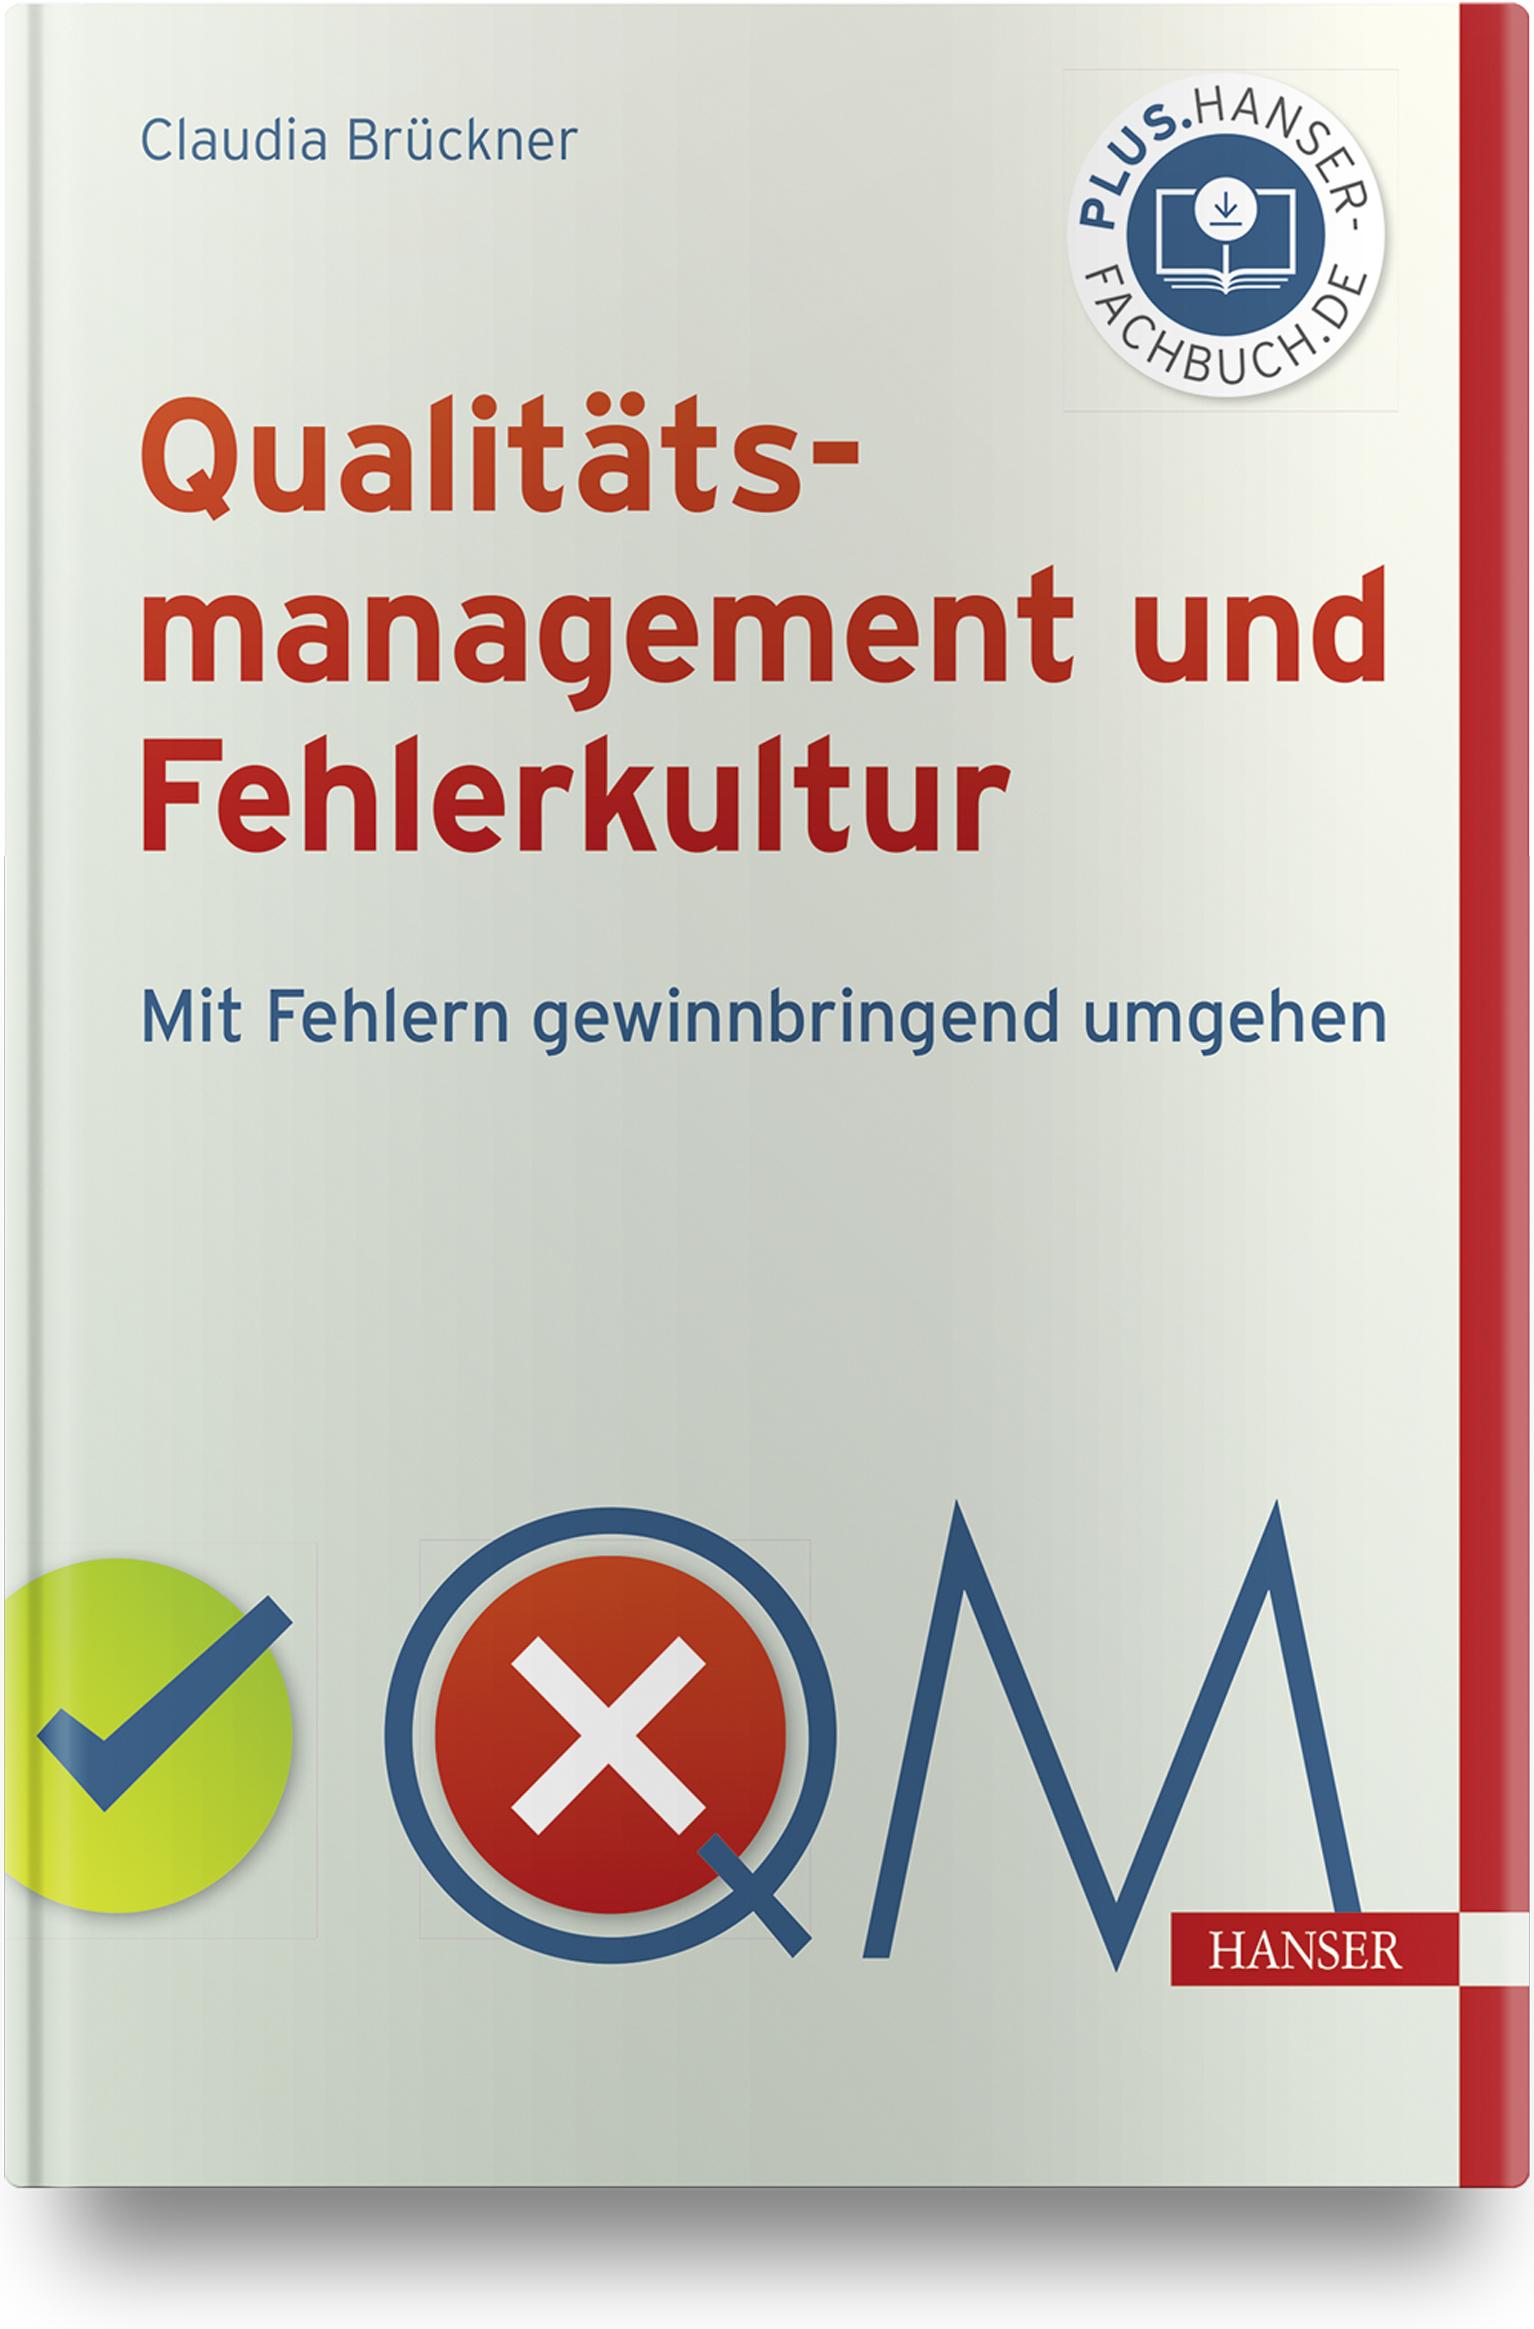 Brückner, Qualitätsmanagement und Fehlerkultur, 978-3-446-46701-9